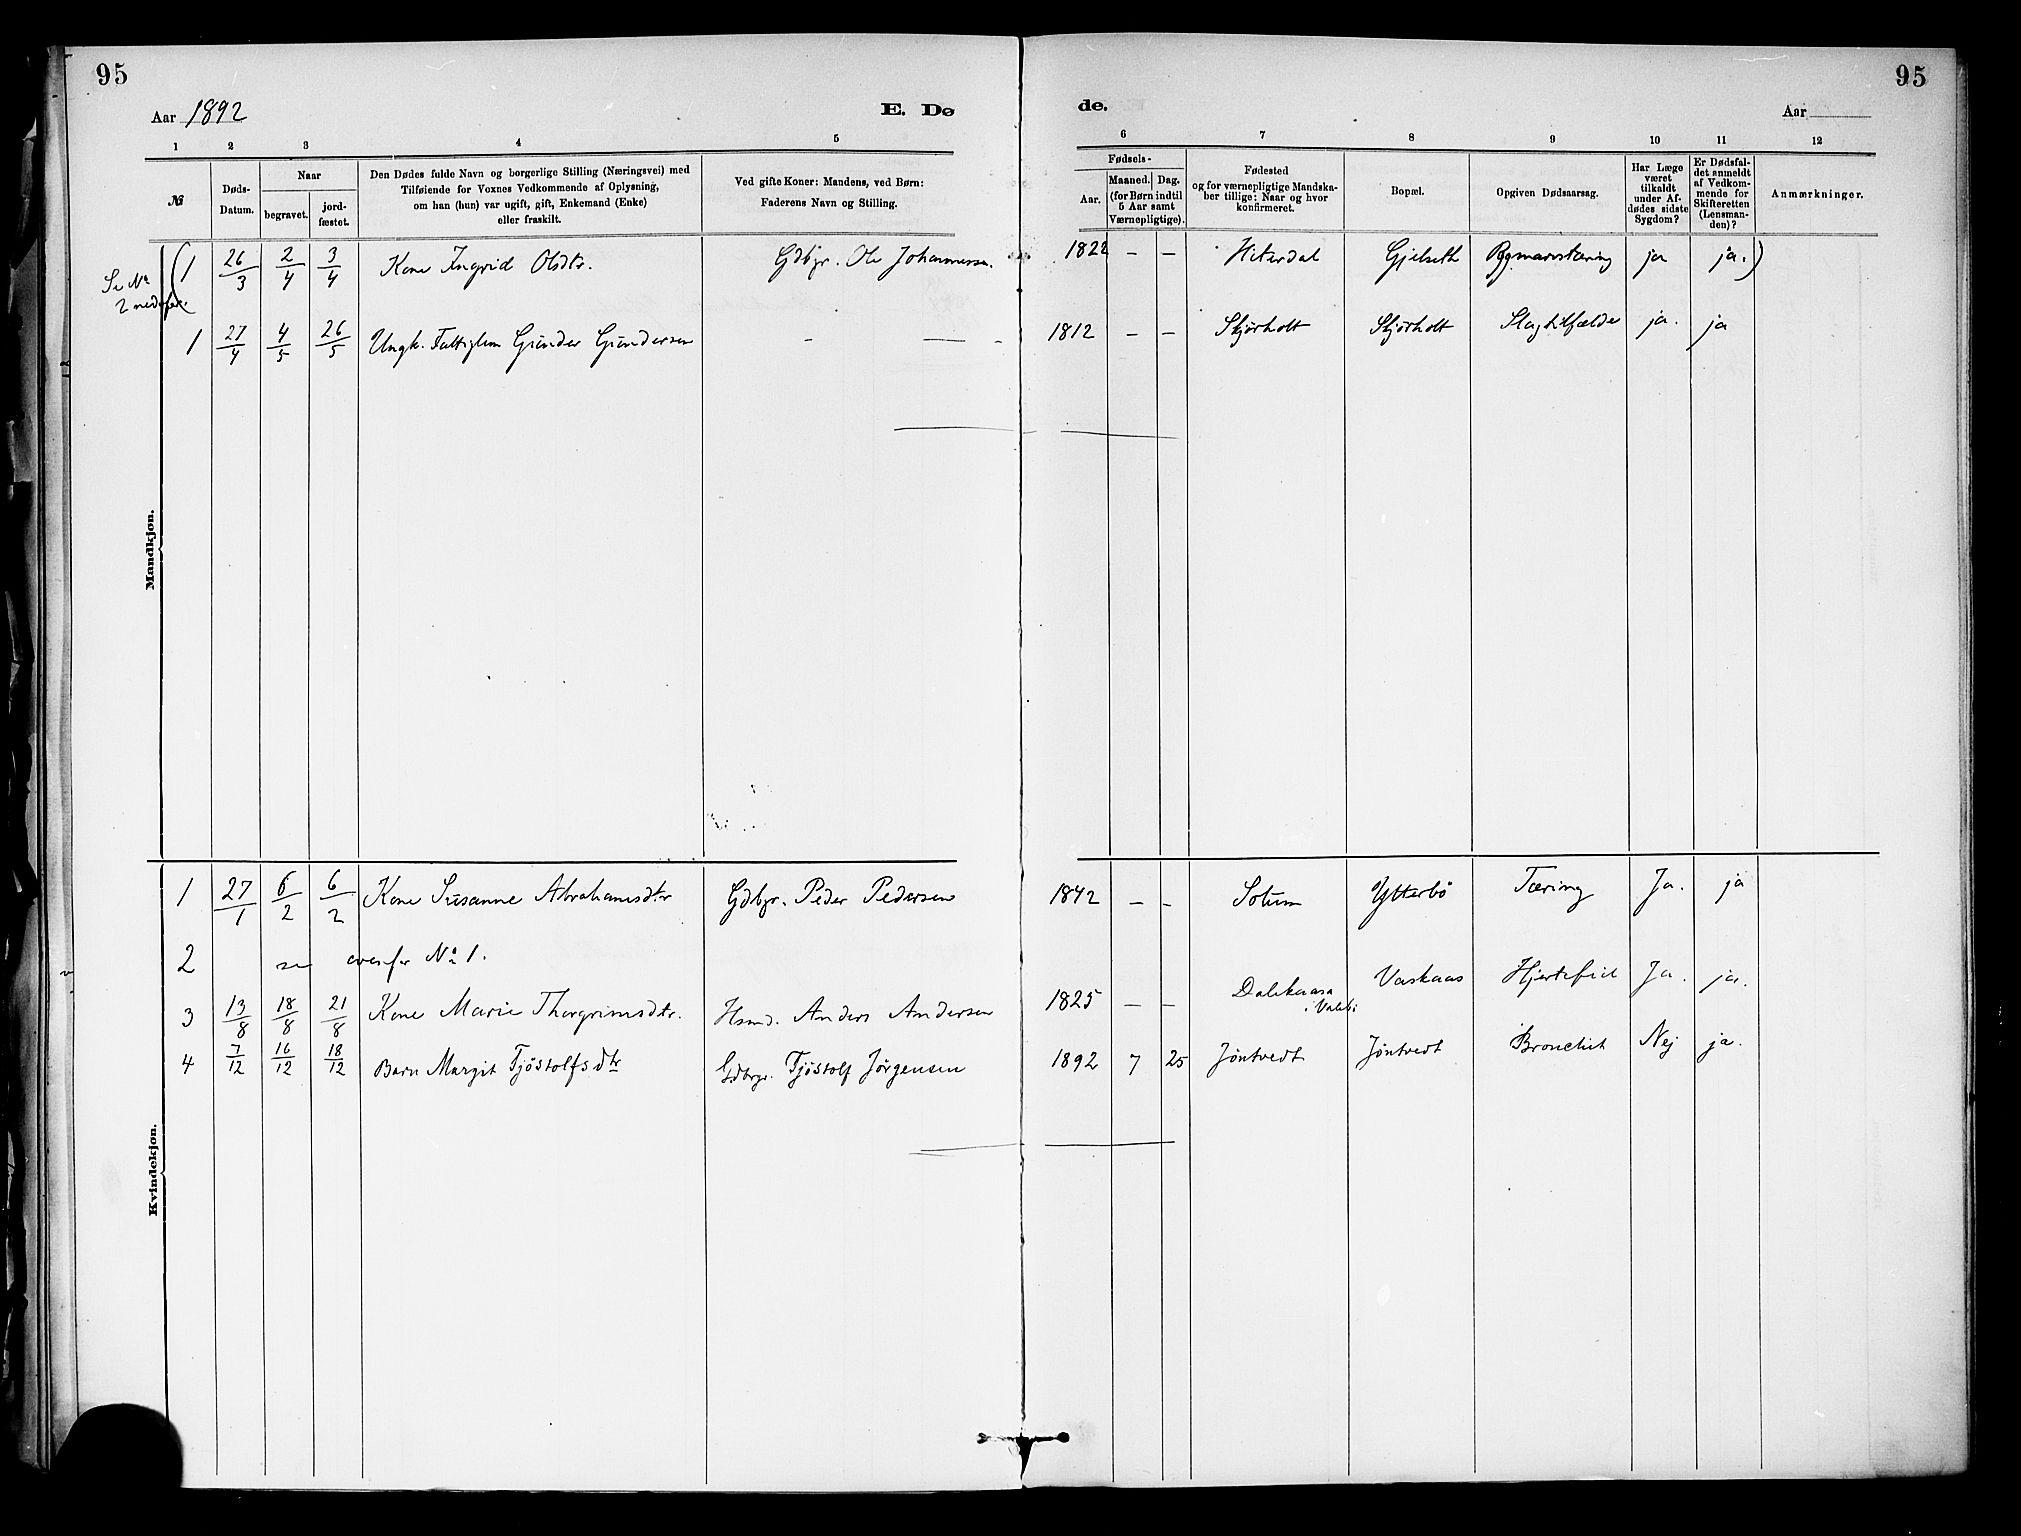 SAKO, Holla kirkebøker, F/Fa/L0009: Ministerialbok nr. 9, 1881-1897, s. 95